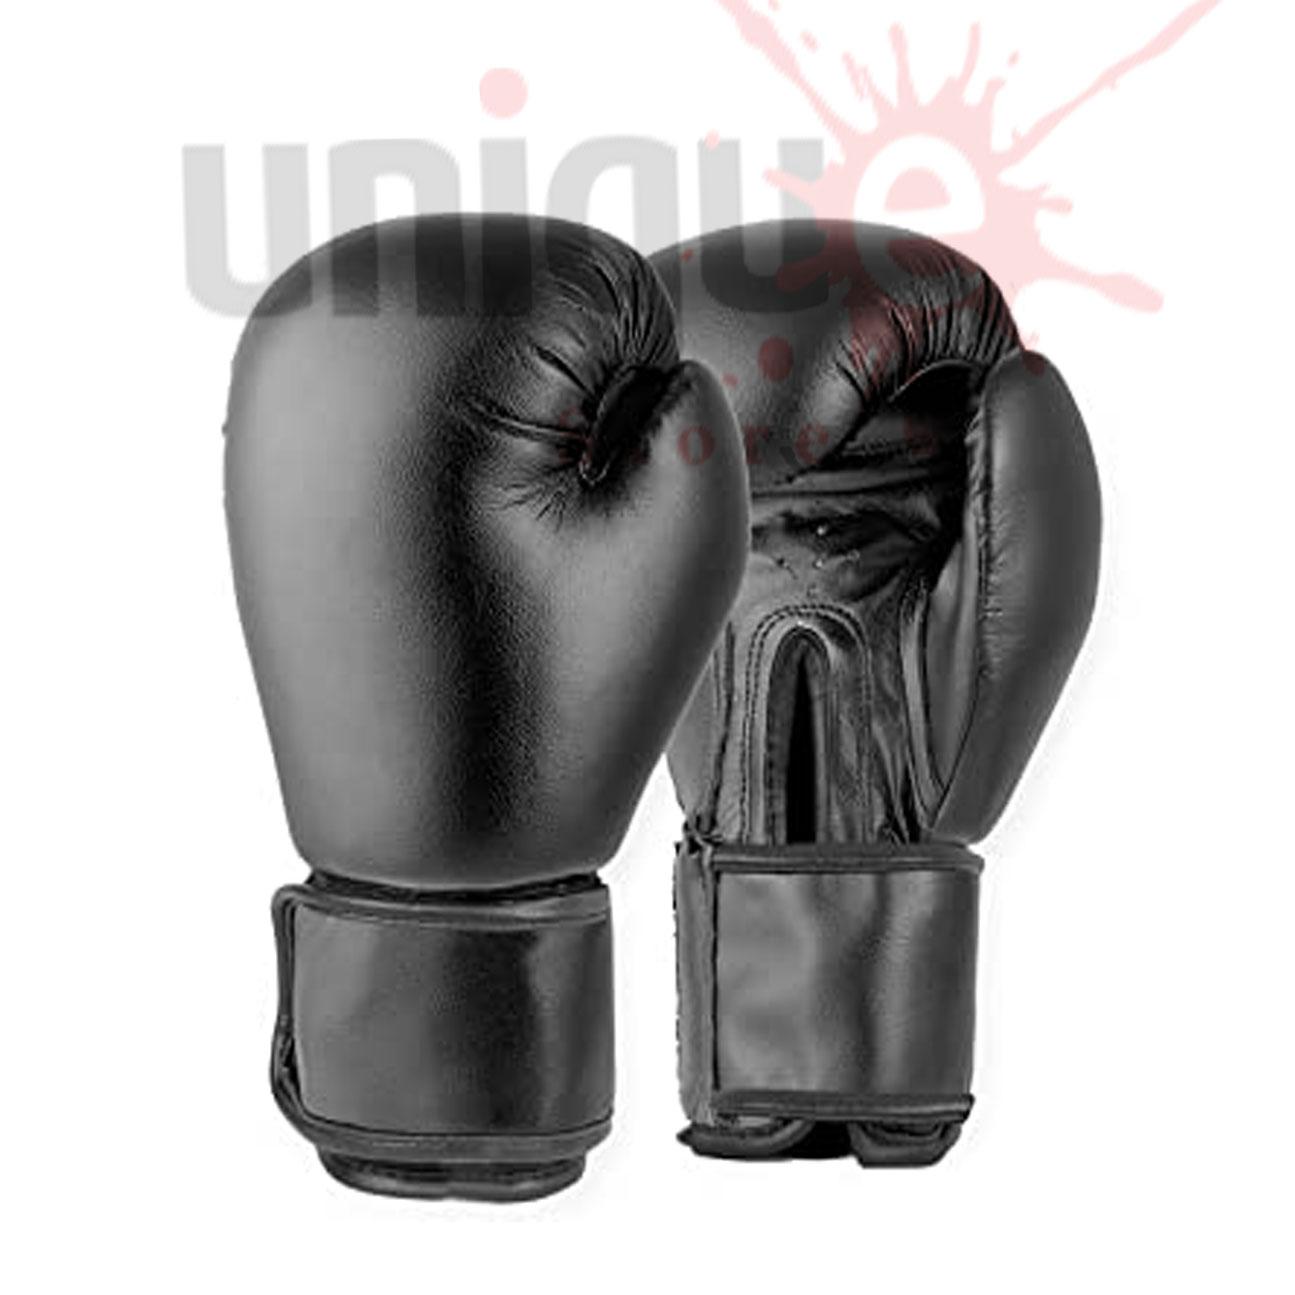 Boxing gloves 12oz Black